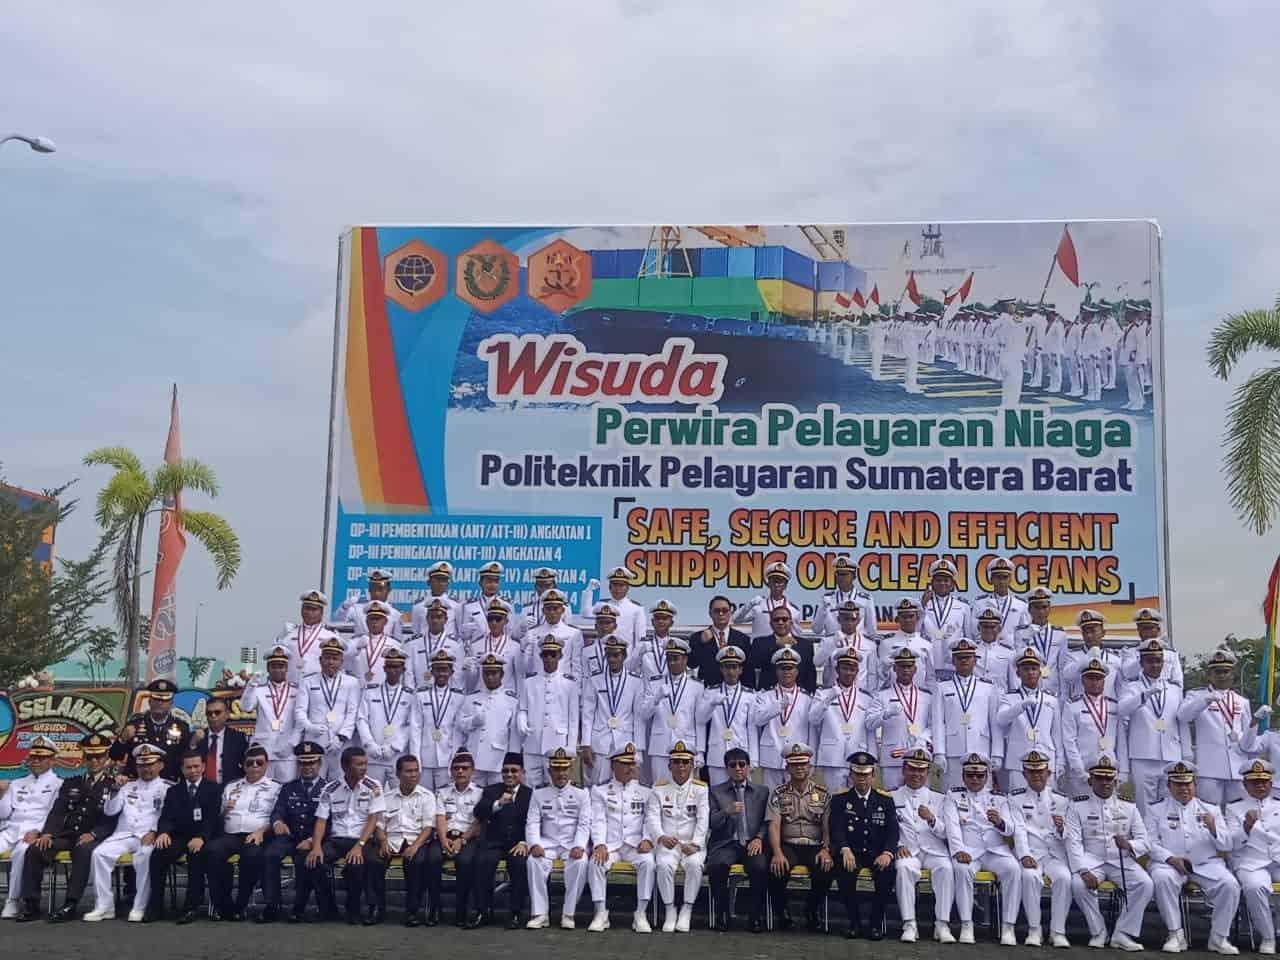 Kadispers Lanud Sutan Sjahrir Hadiri Wisuda Perwira Pelayaran Niaga Di Kota Pariaman